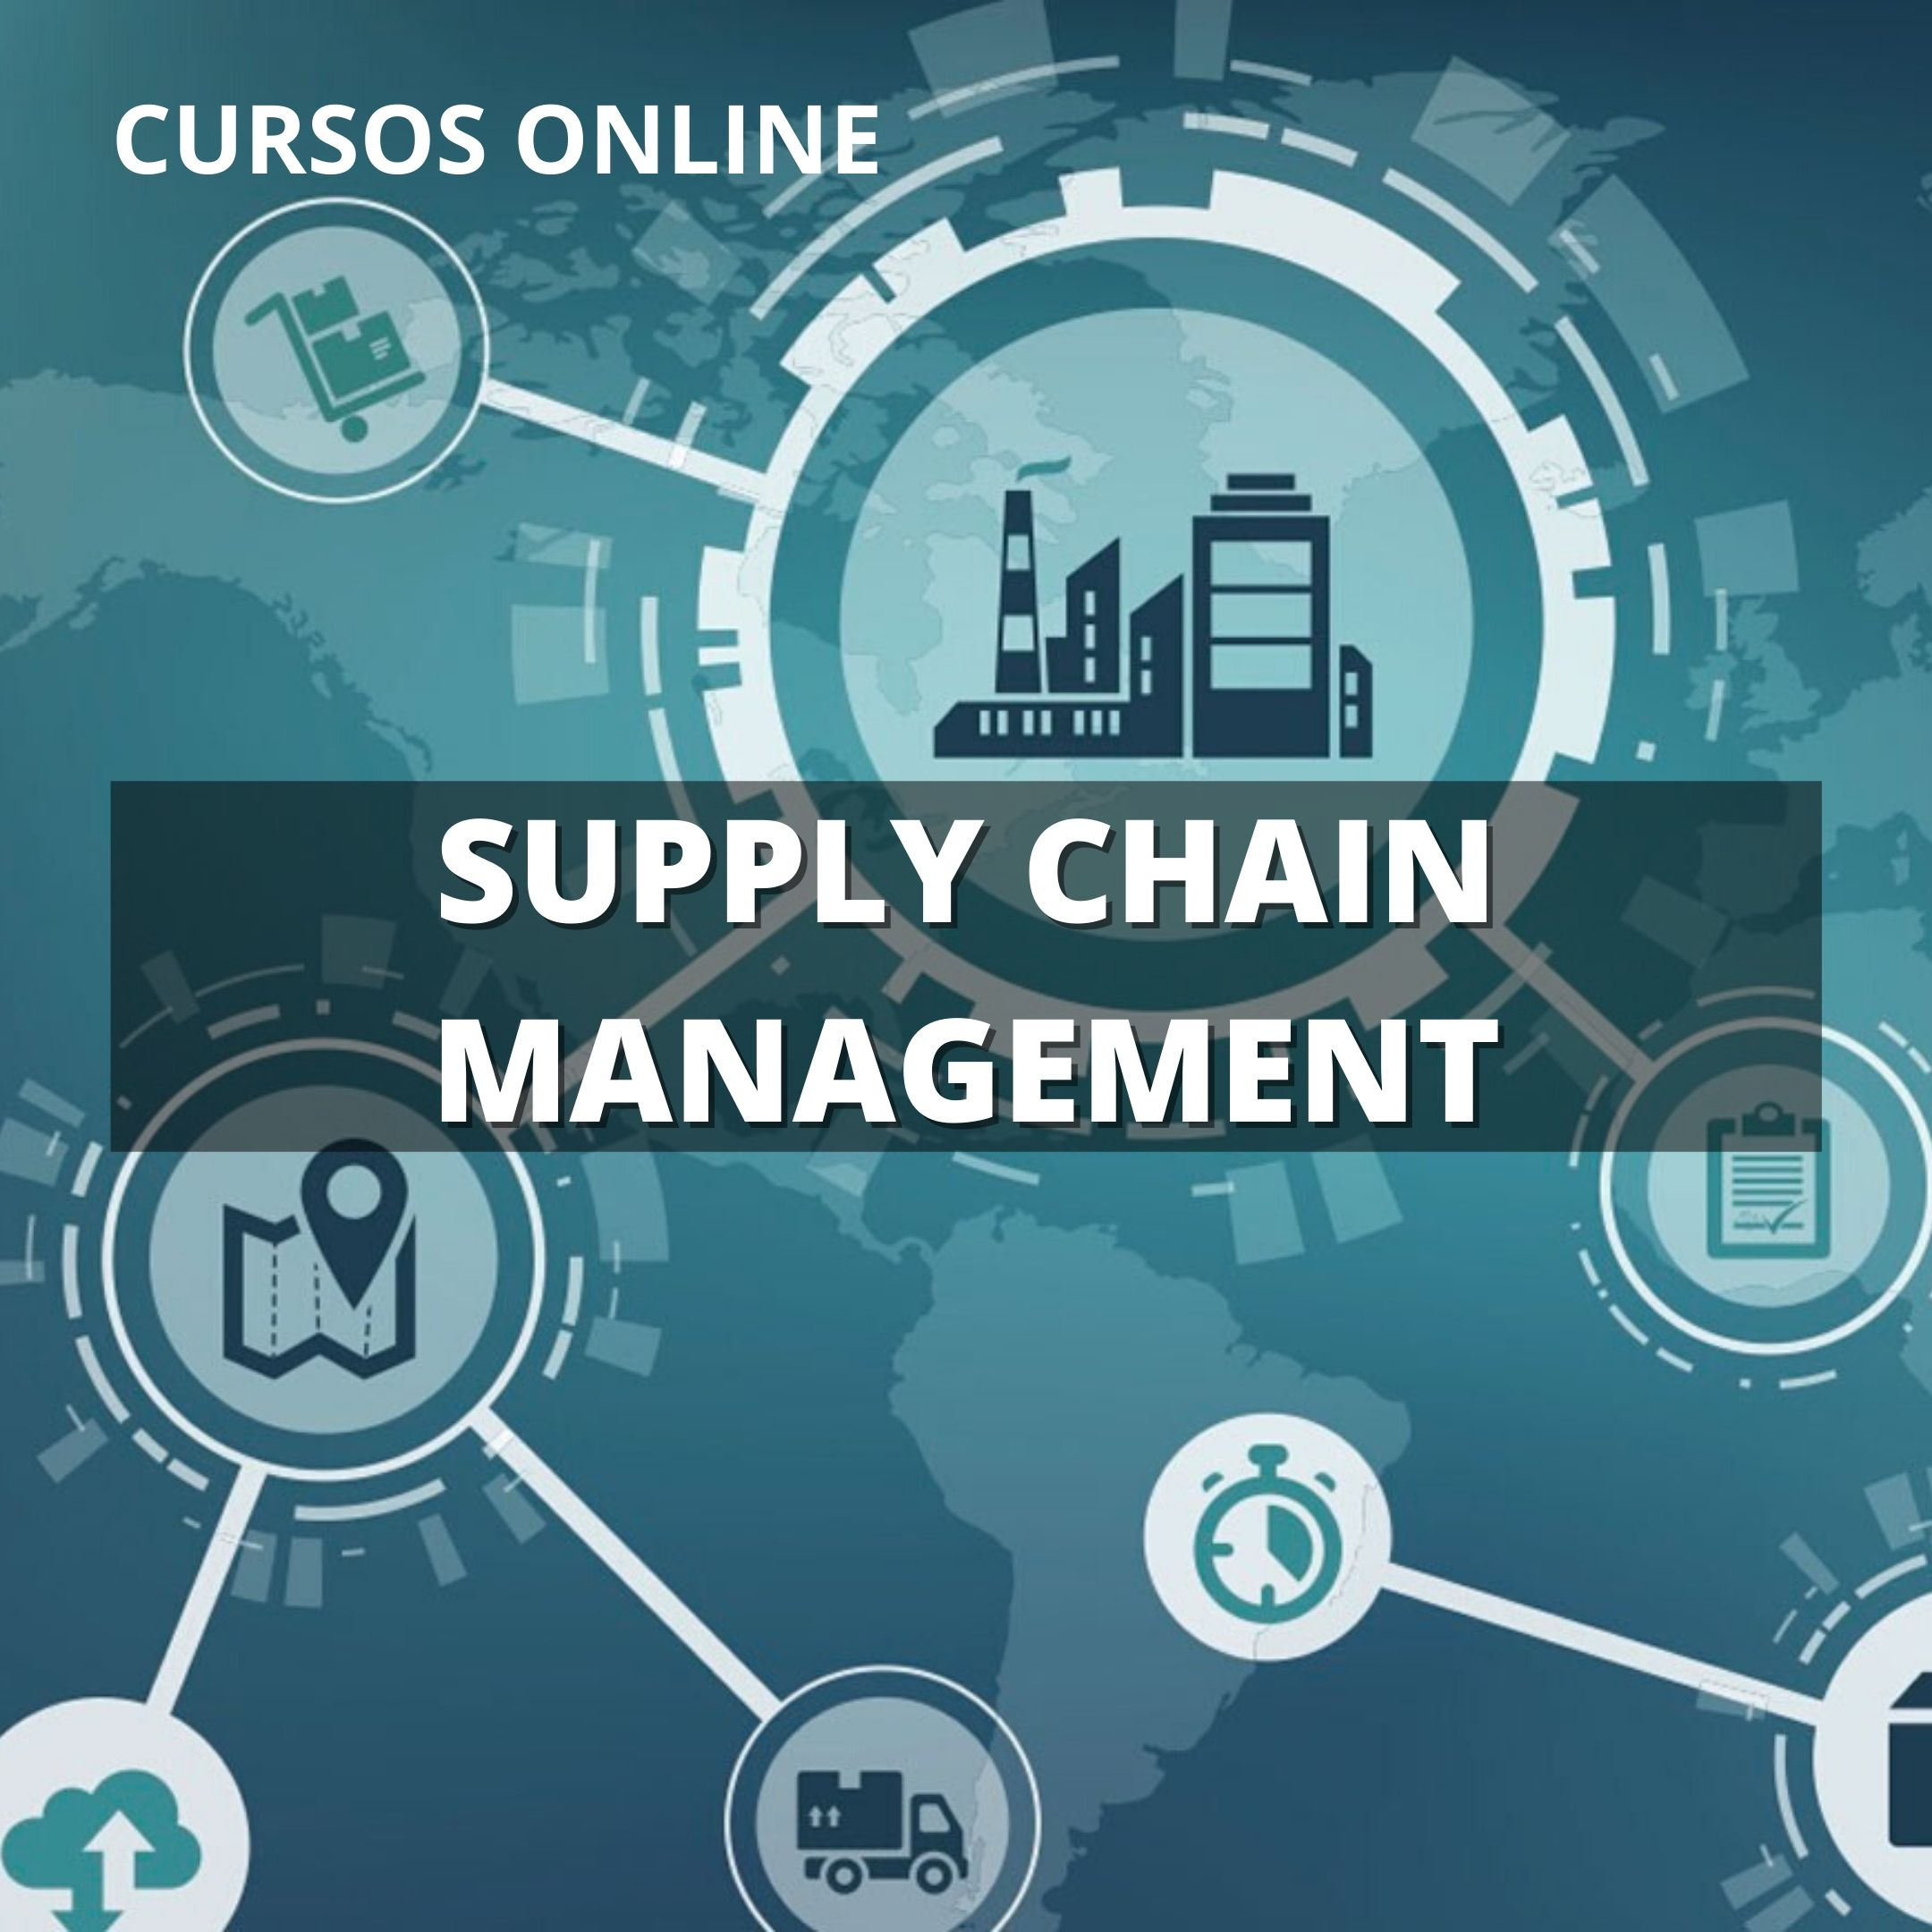 cursos online supply chain management